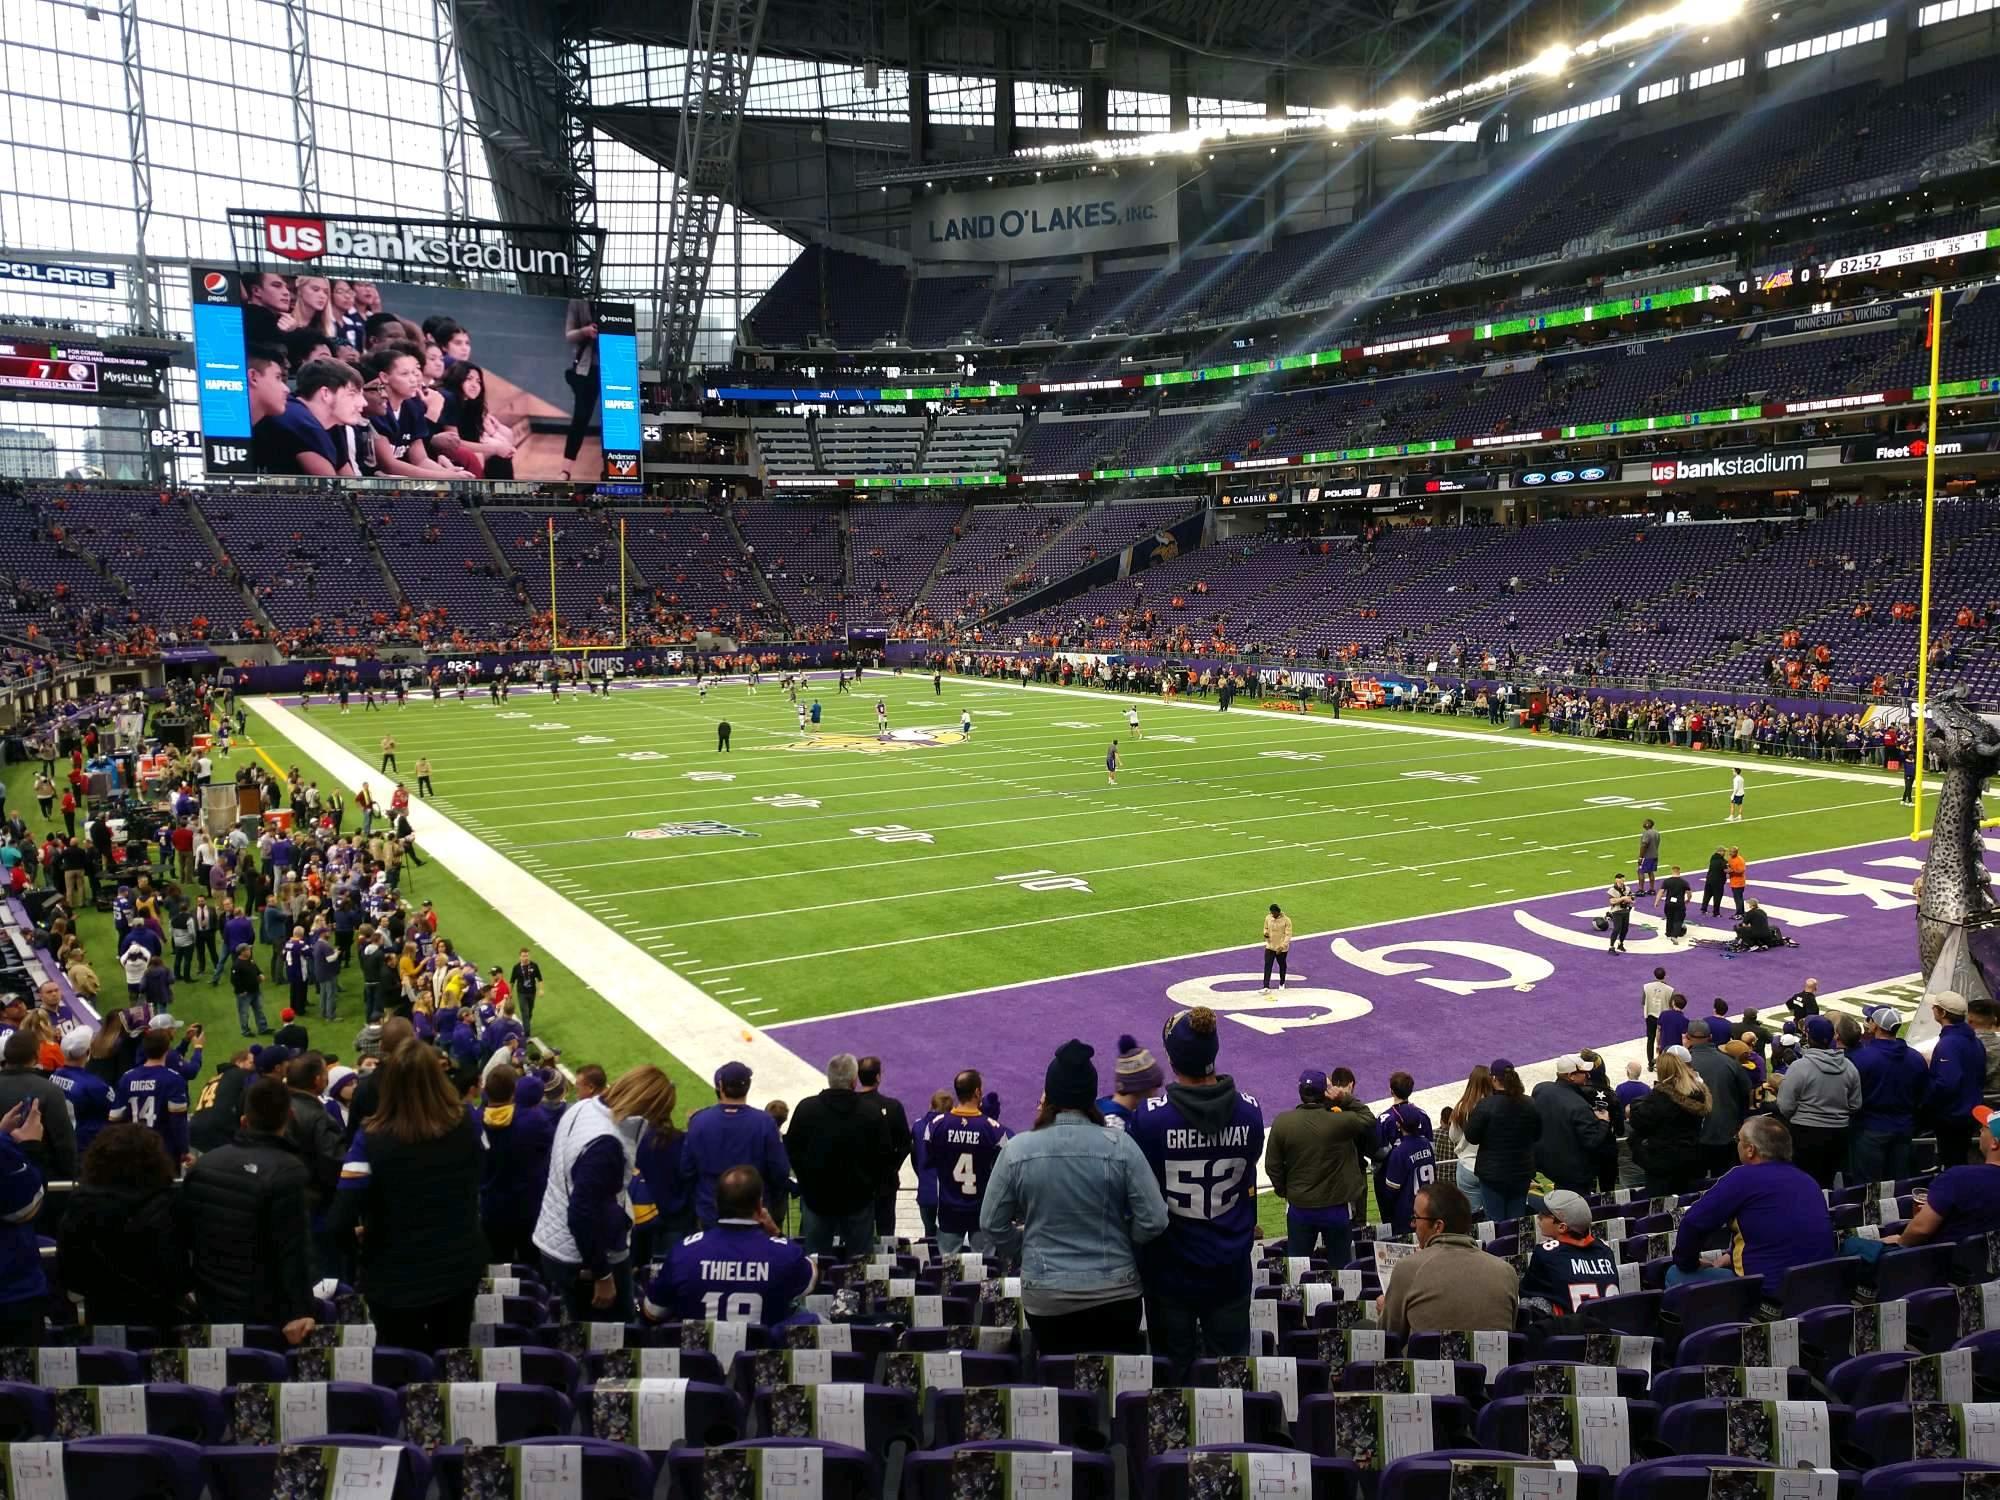 U.S. Bank Stadium Section 122 Row 17 Seat 21